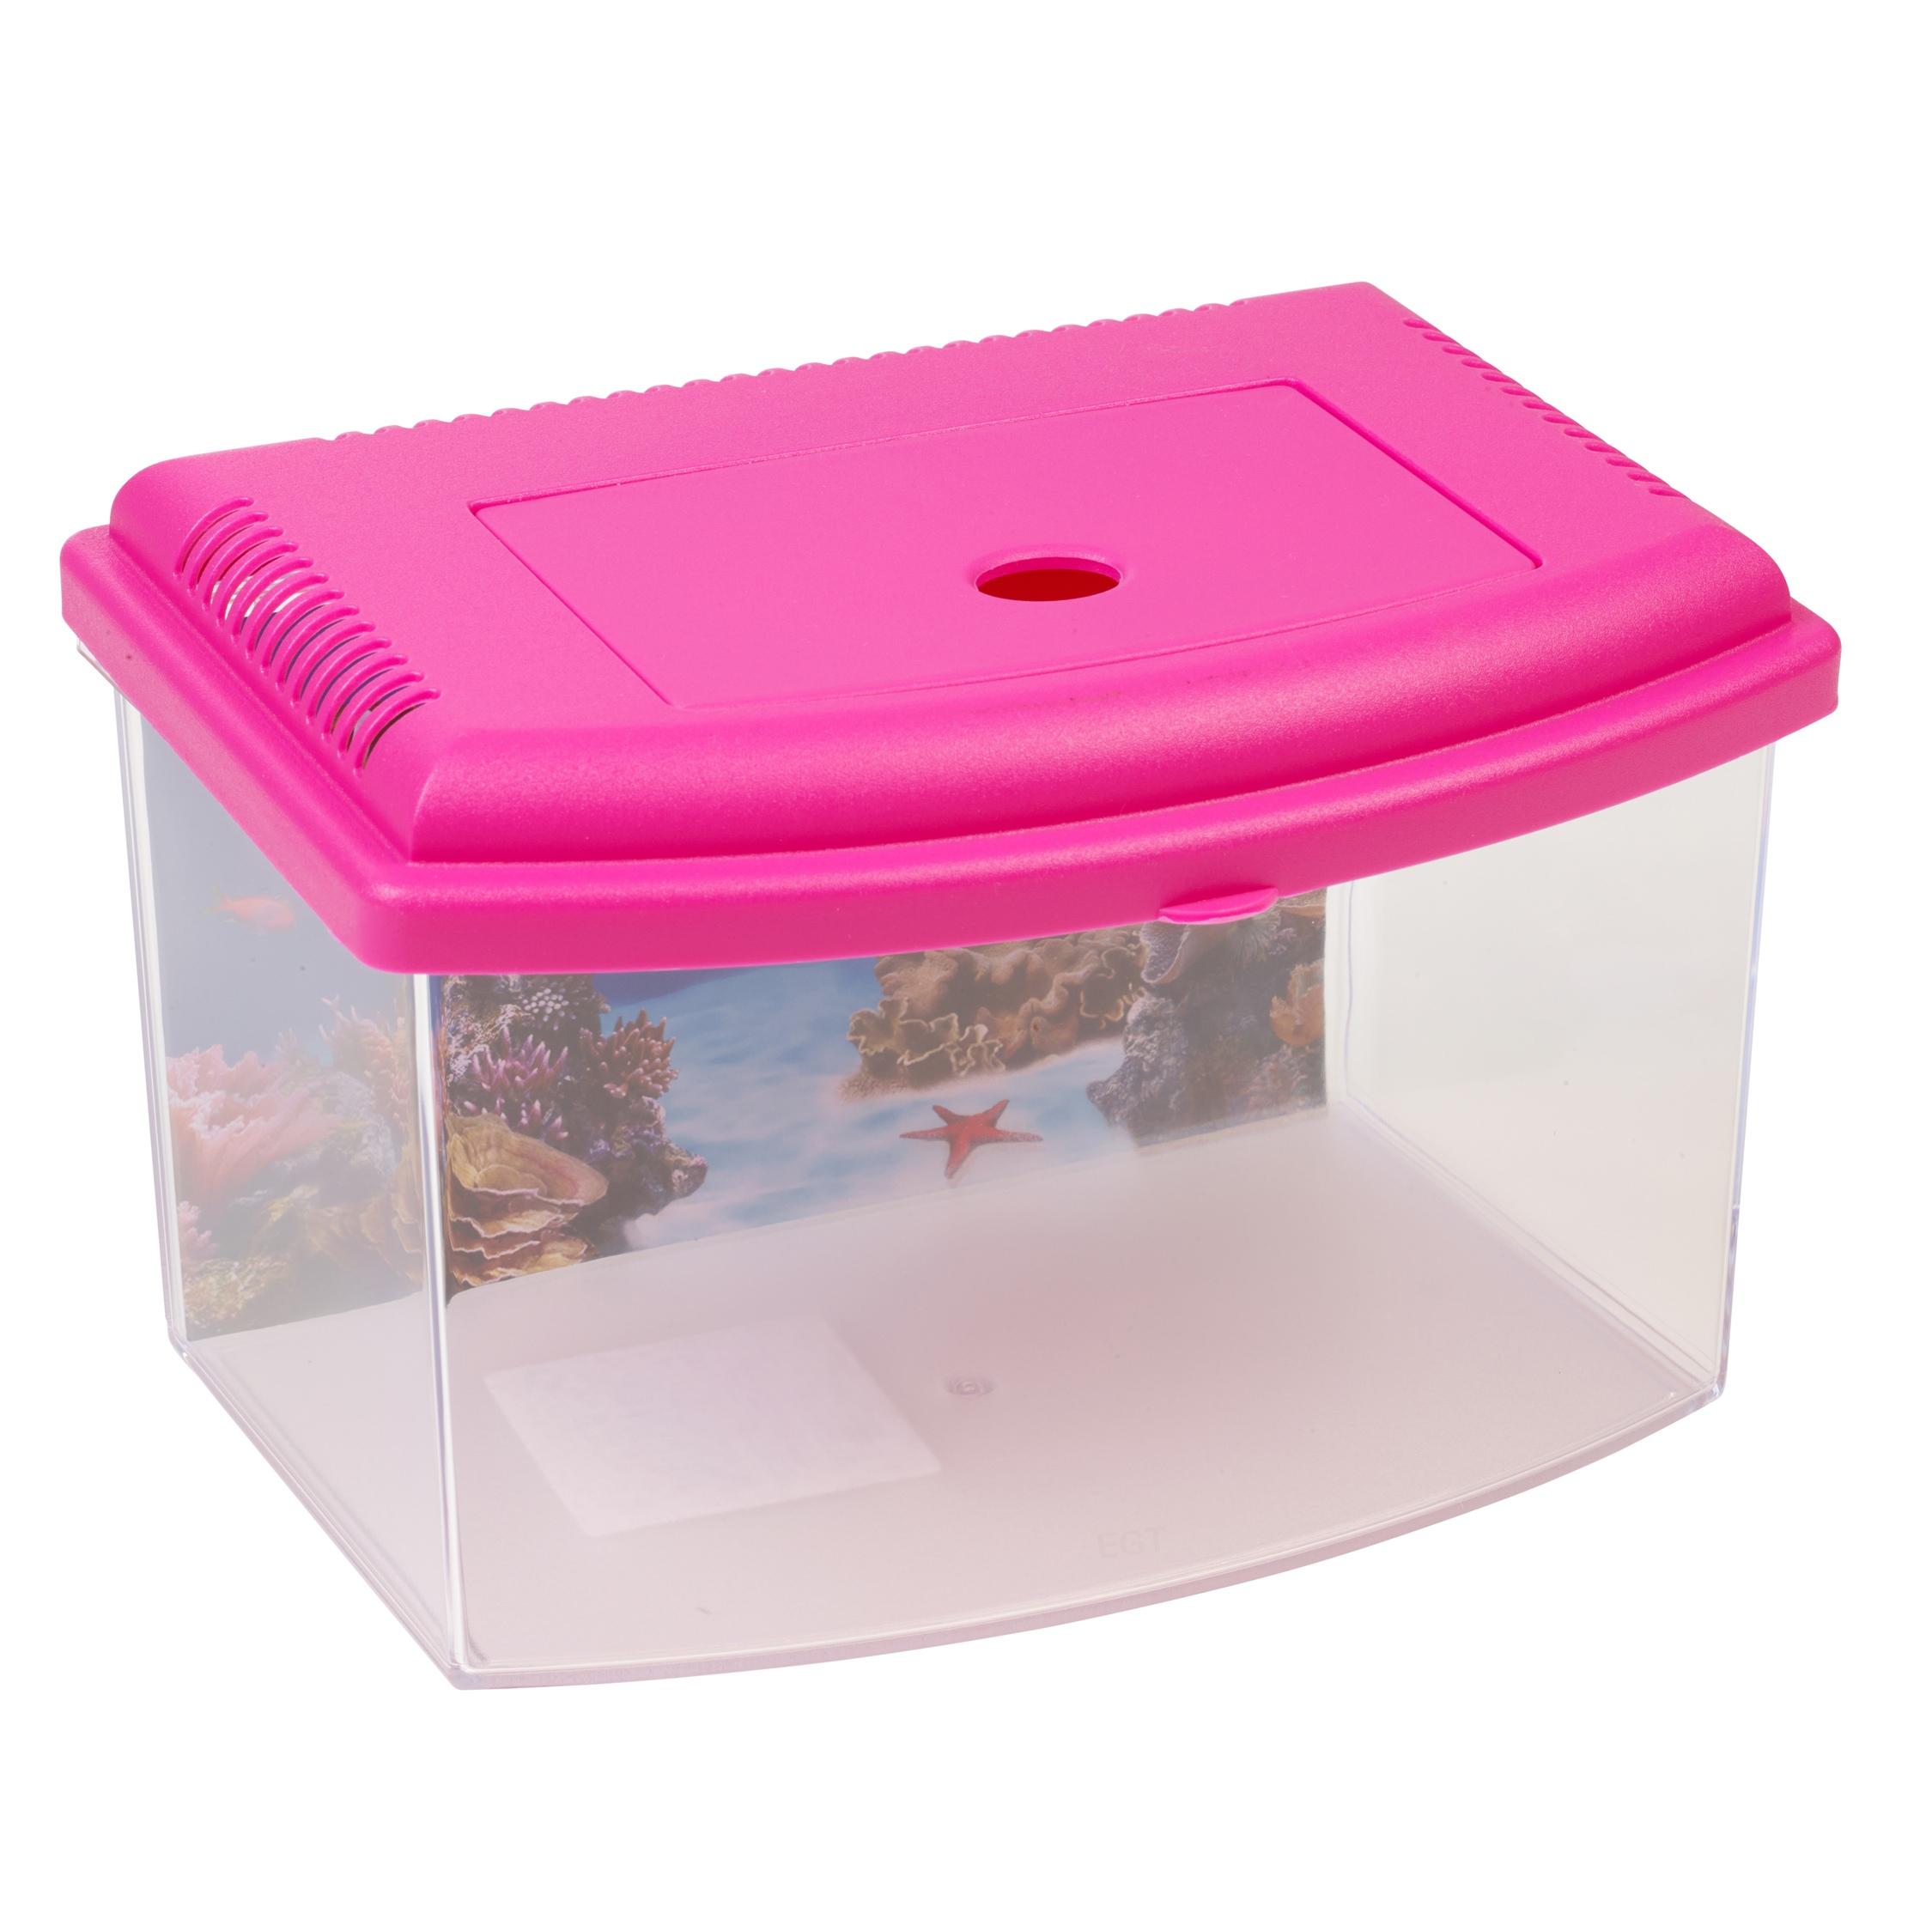 6 litre starter aquarium fish reptile insect tank vivarium for Pink fish tank